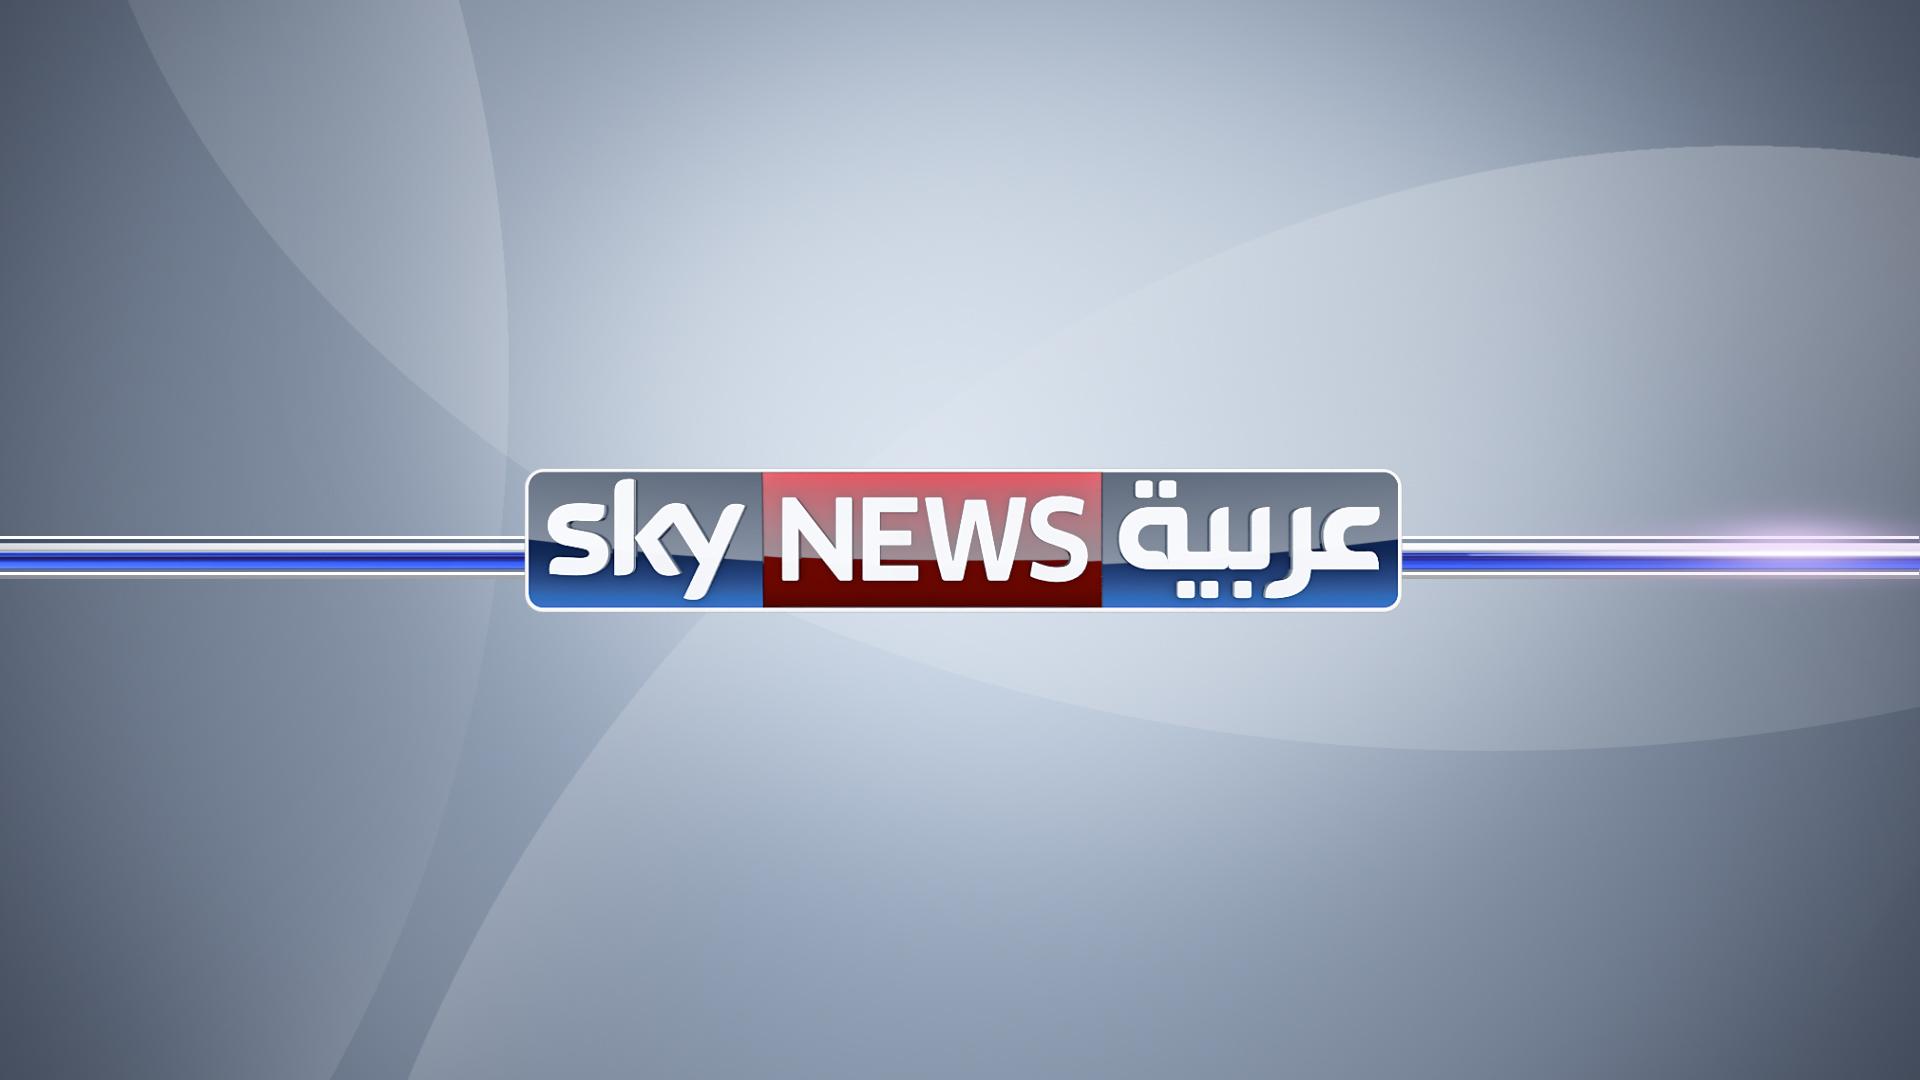 NCS_Sky-News_004